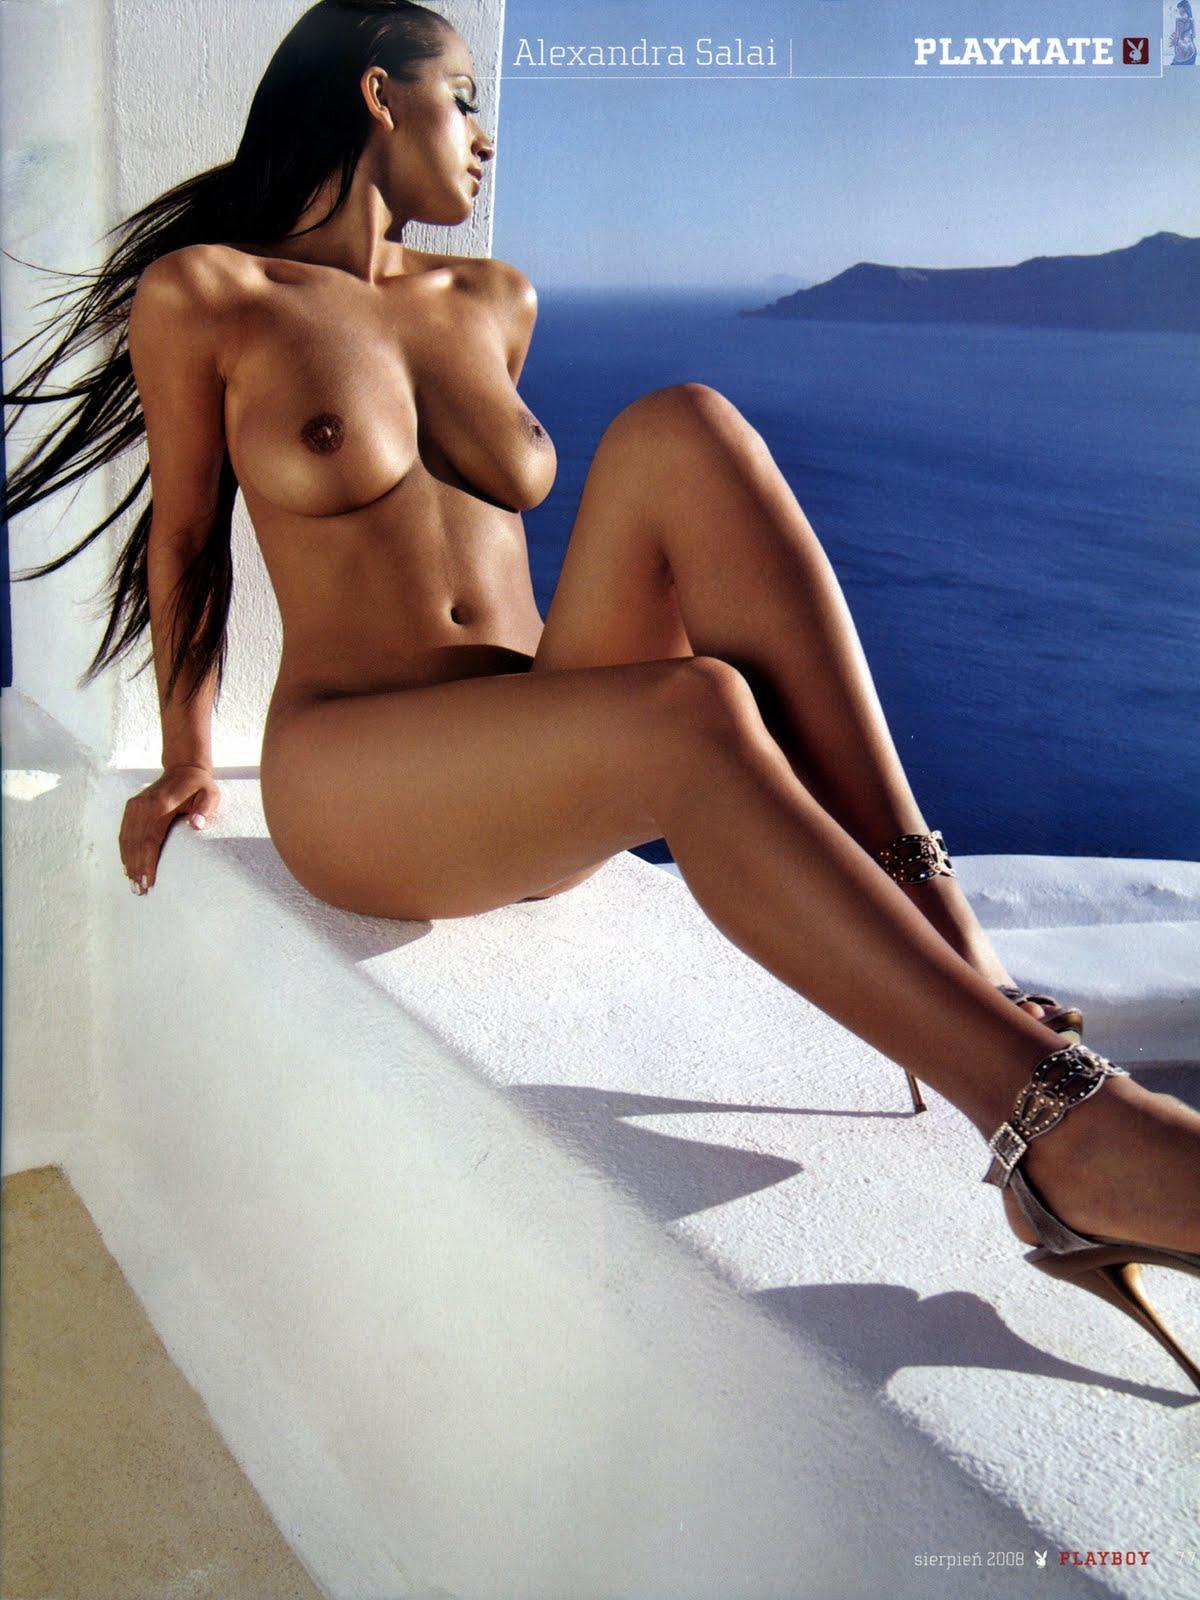 http://1.bp.blogspot.com/-HQG2ARczGCU/Tn5VUKegFcI/AAAAAAAACsk/x3DB3ogDZy0/s1600/98535-alexandra-salai2-122-666lo.jpg